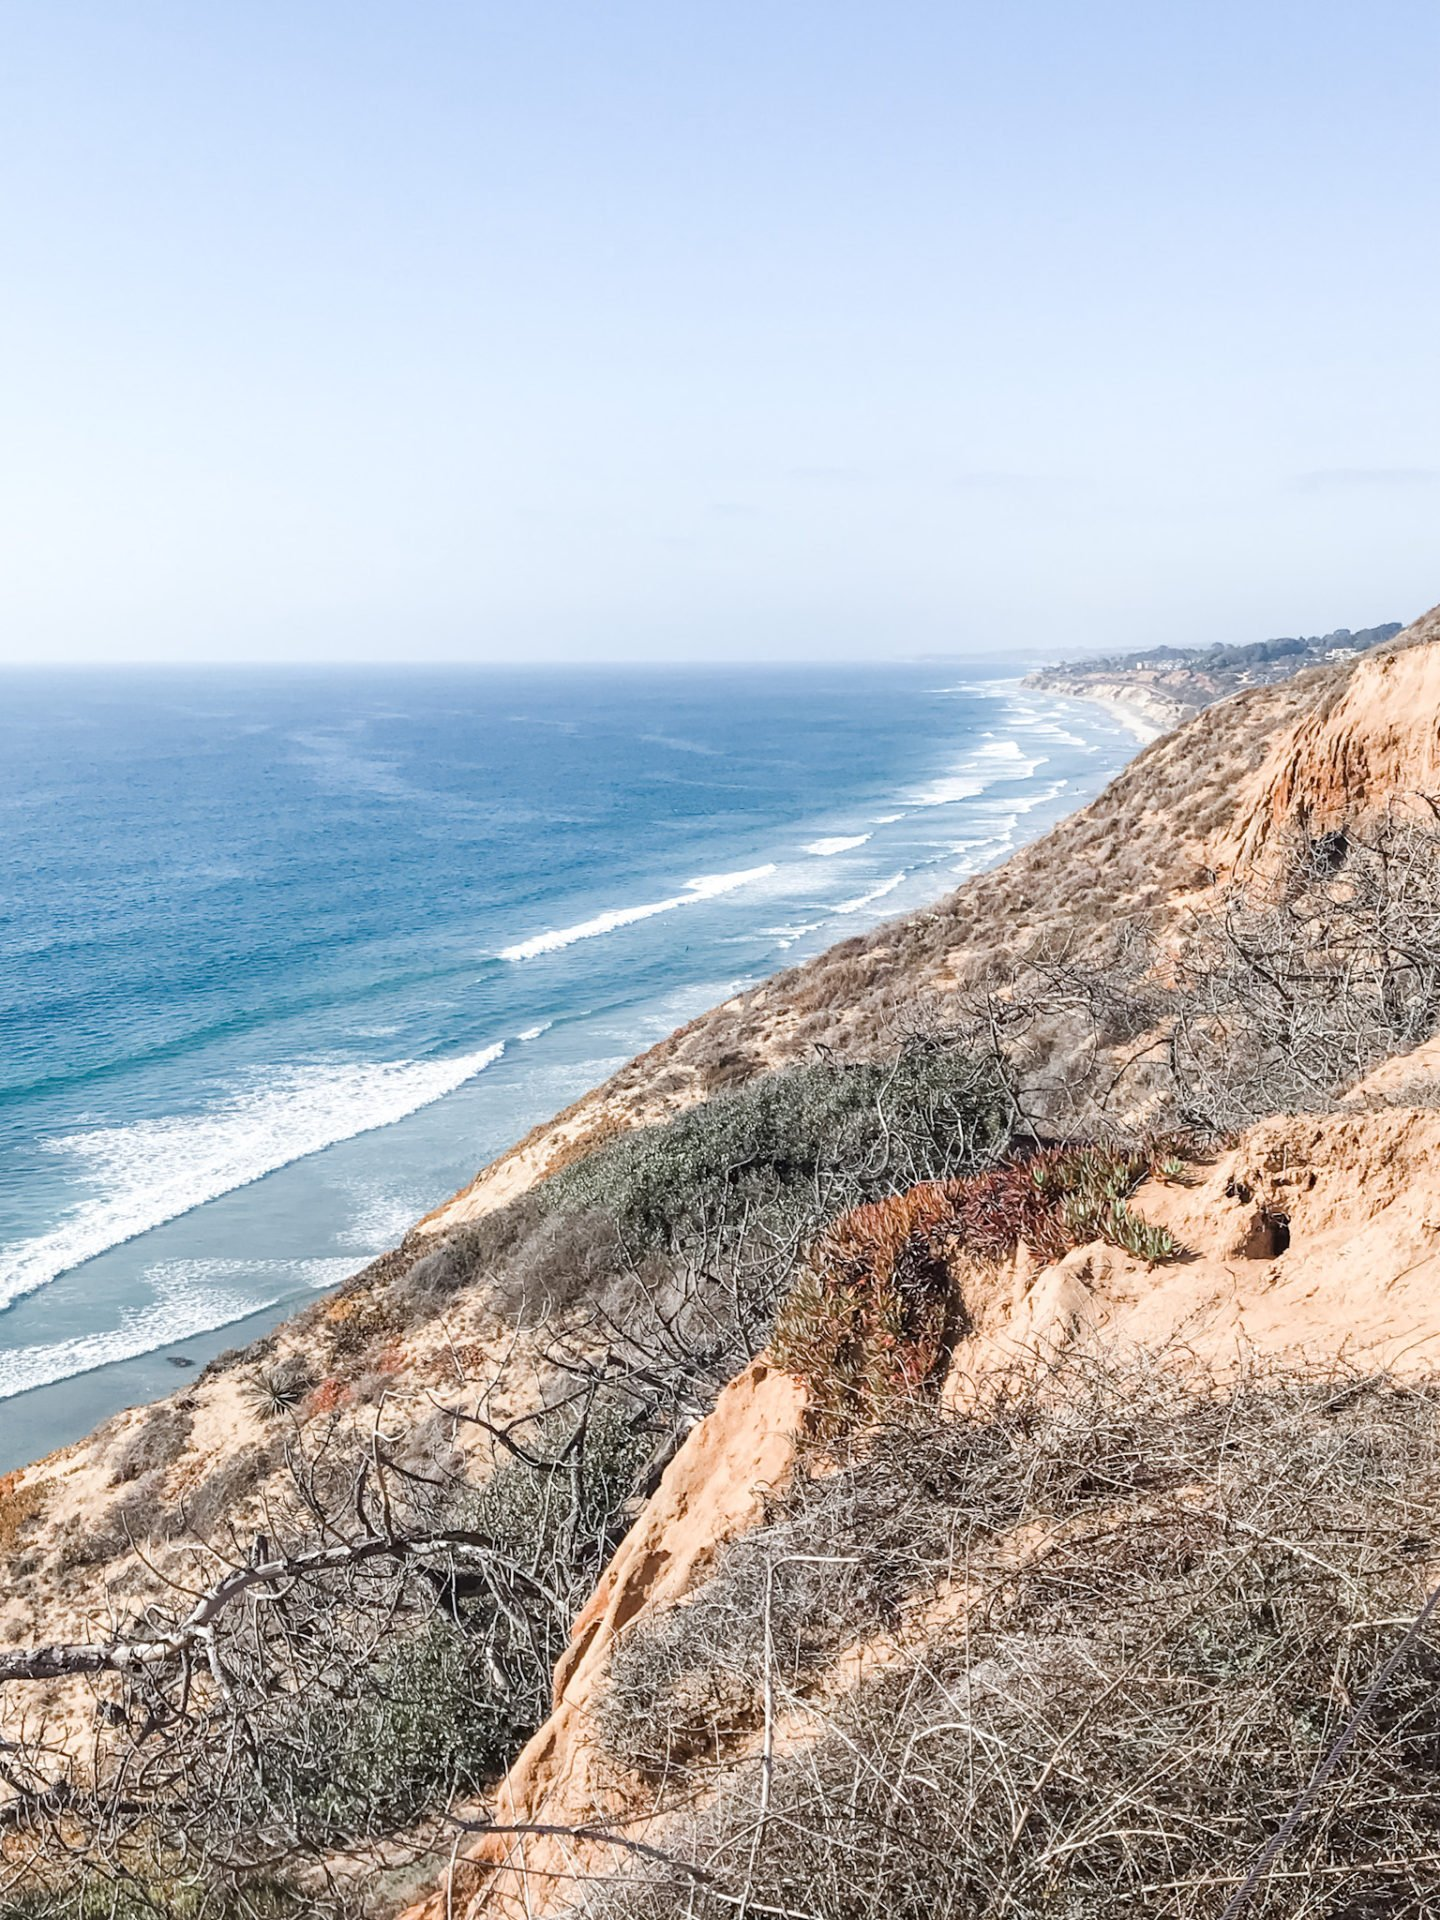 California Road Trip: Day 6 & 7 in San Diego & Coronado